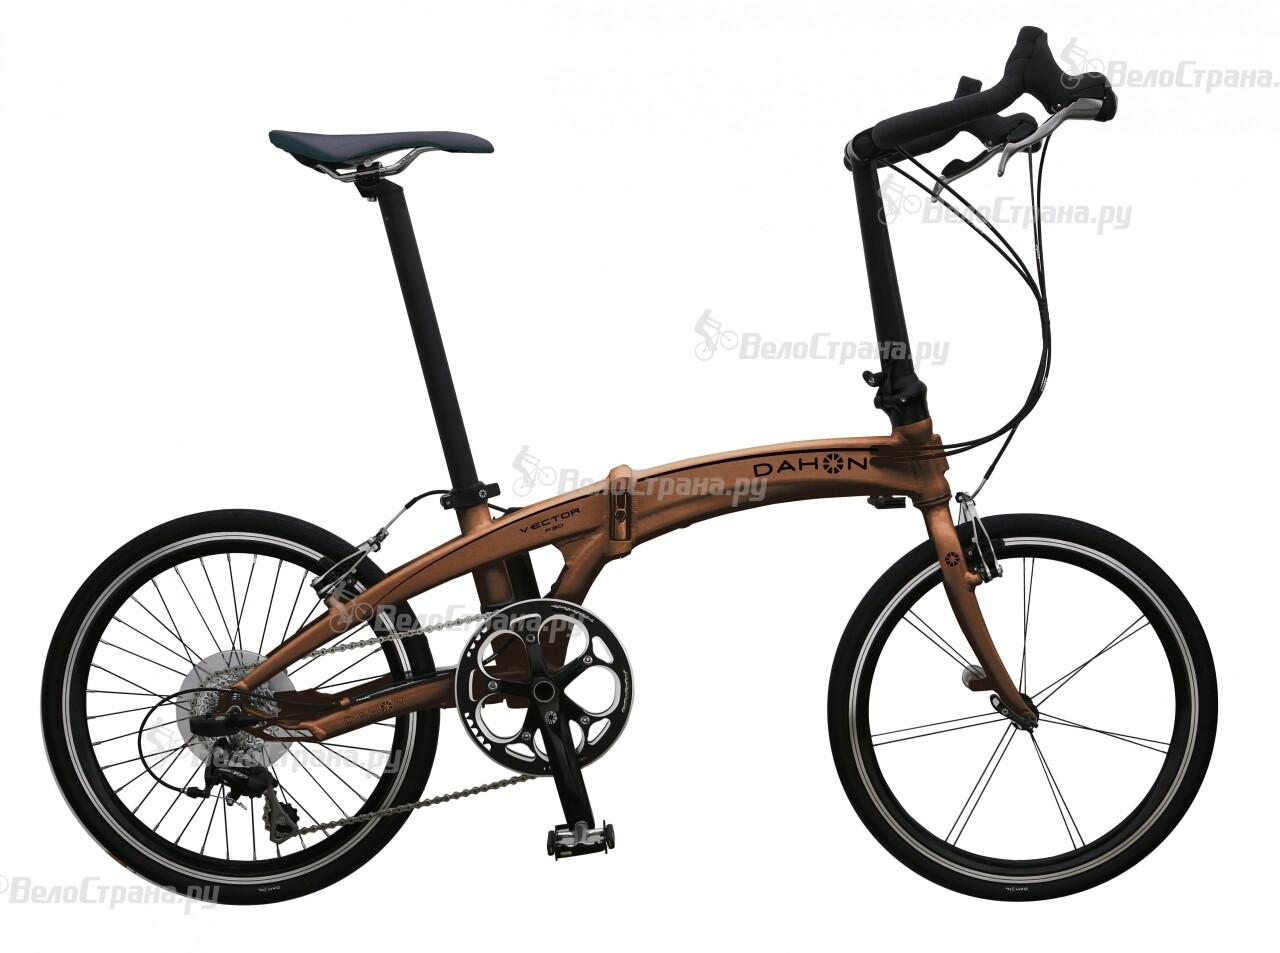 Велосипед Dahon Vector DD30 (2016)